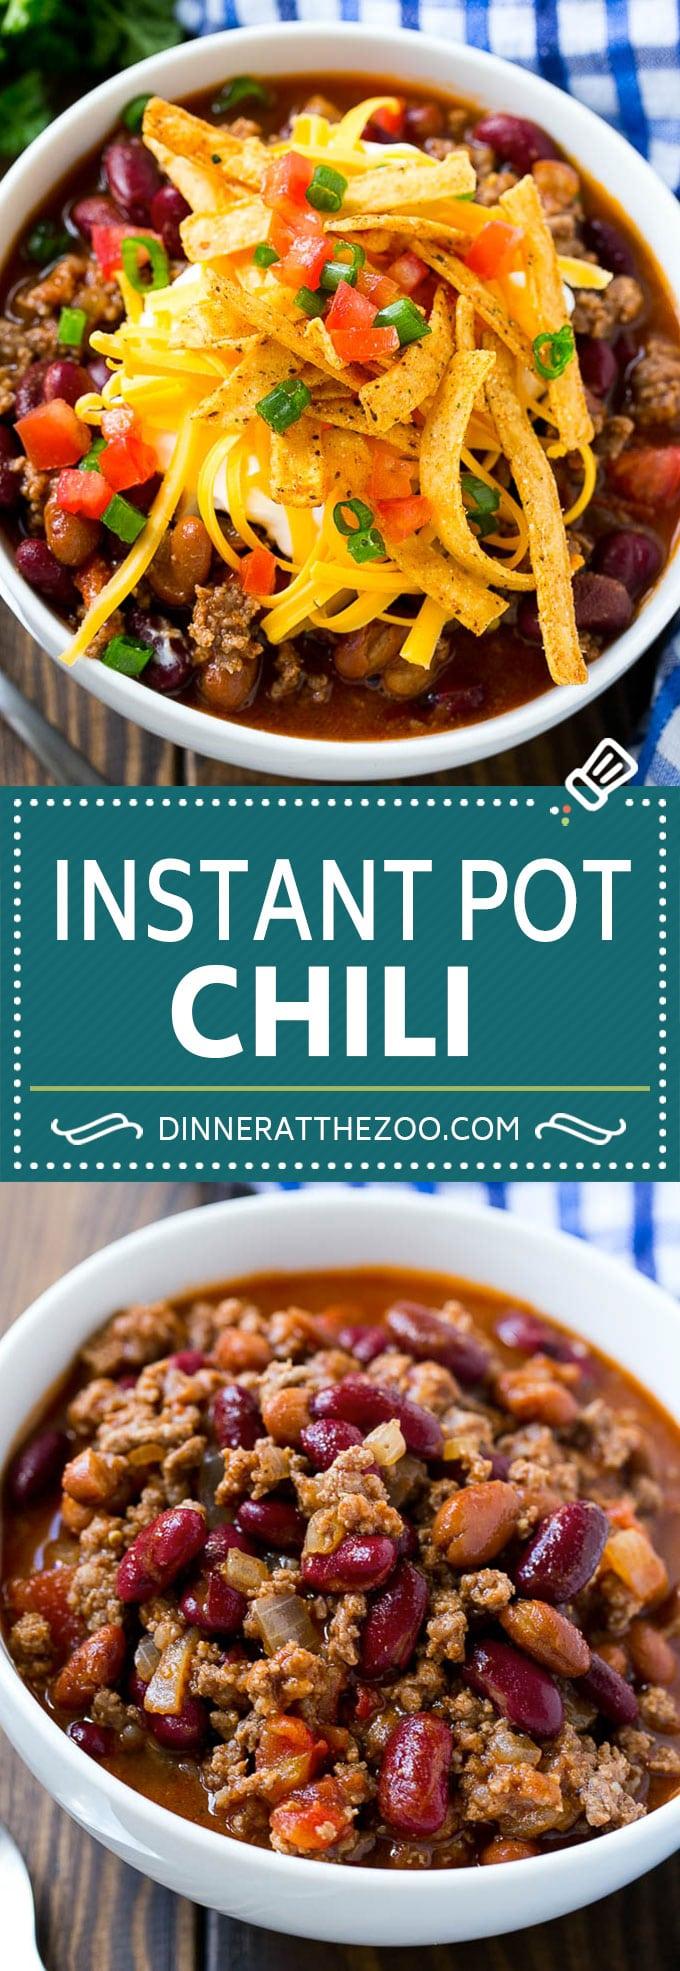 Instant Pot Chili | Beef Chili | Easy Chili Recipe #instantpot #chili #dinneratthezoo